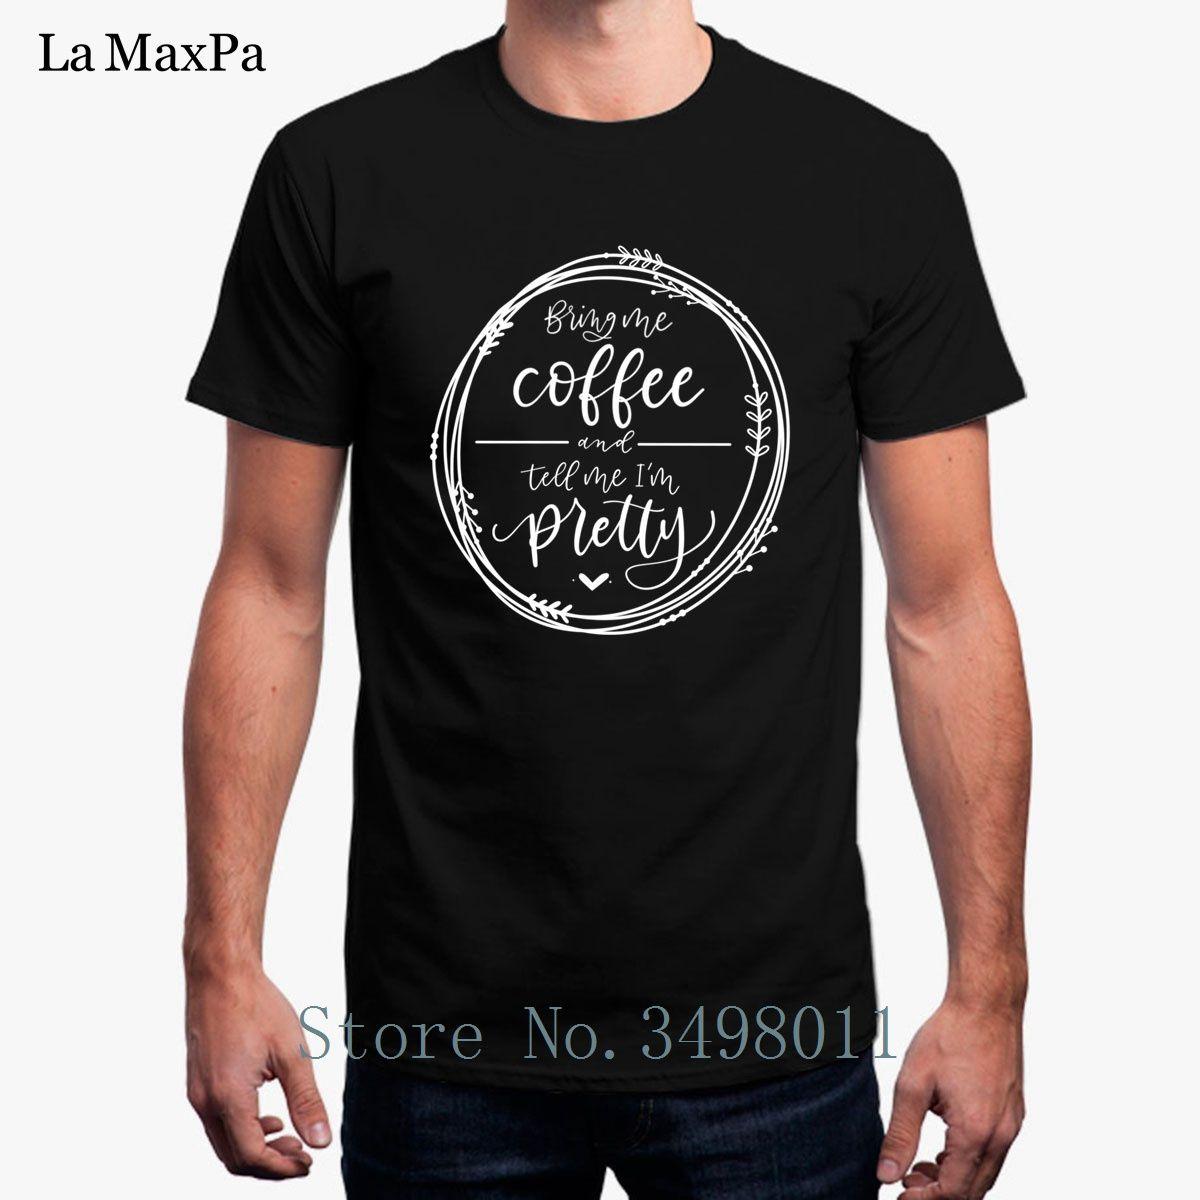 ecfb21009 New Arrival T Shirt Men Bring Me Coffee And Tell Me I'M Pretty Mug Tshirt  Unisex Round Collar Cool T Shirt Men Rude T Shirt Shirt With T Shirt From  ...